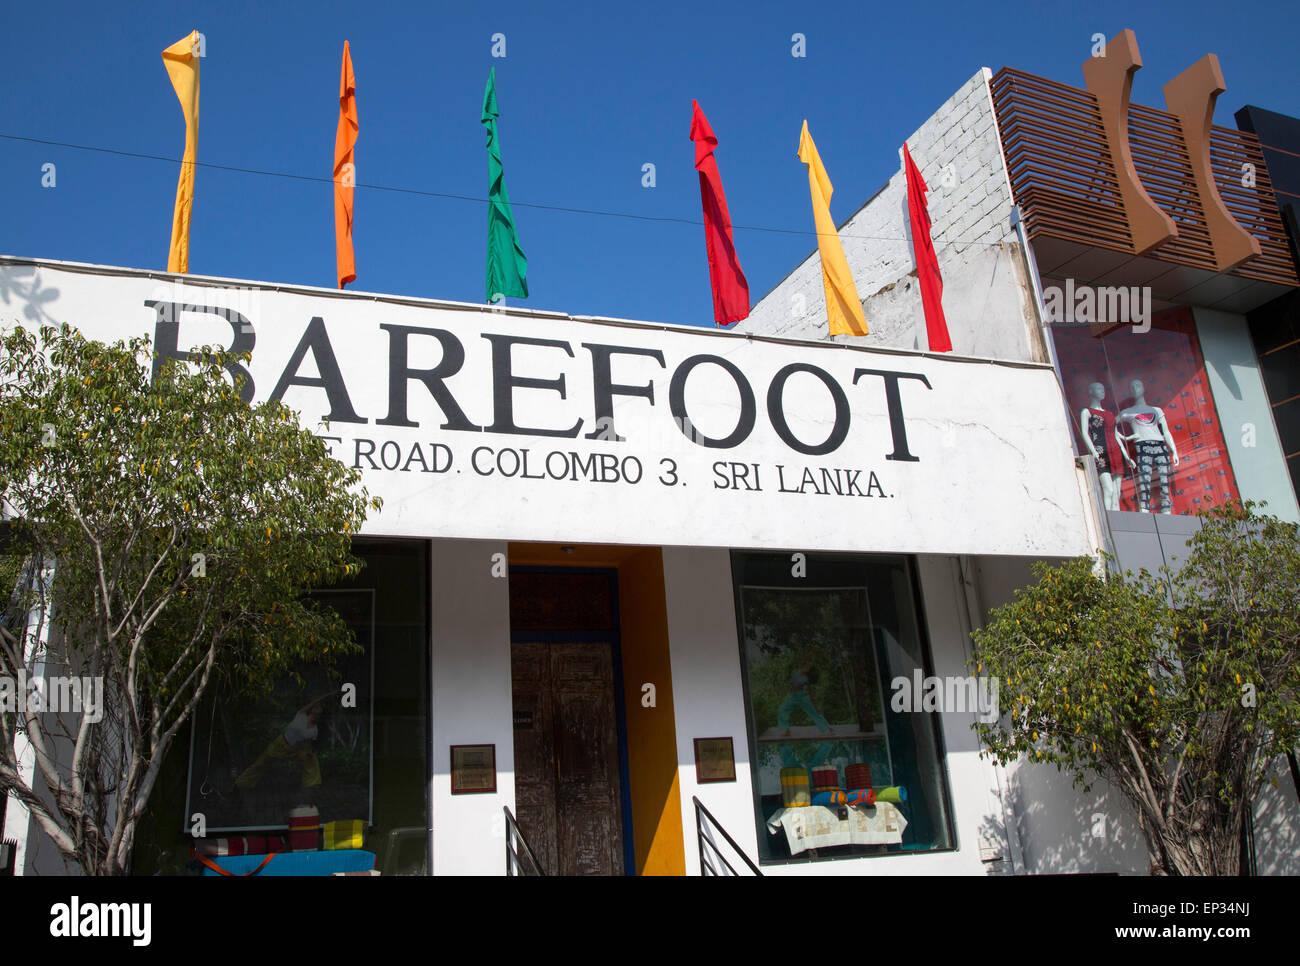 Barefoot colombo online shopping